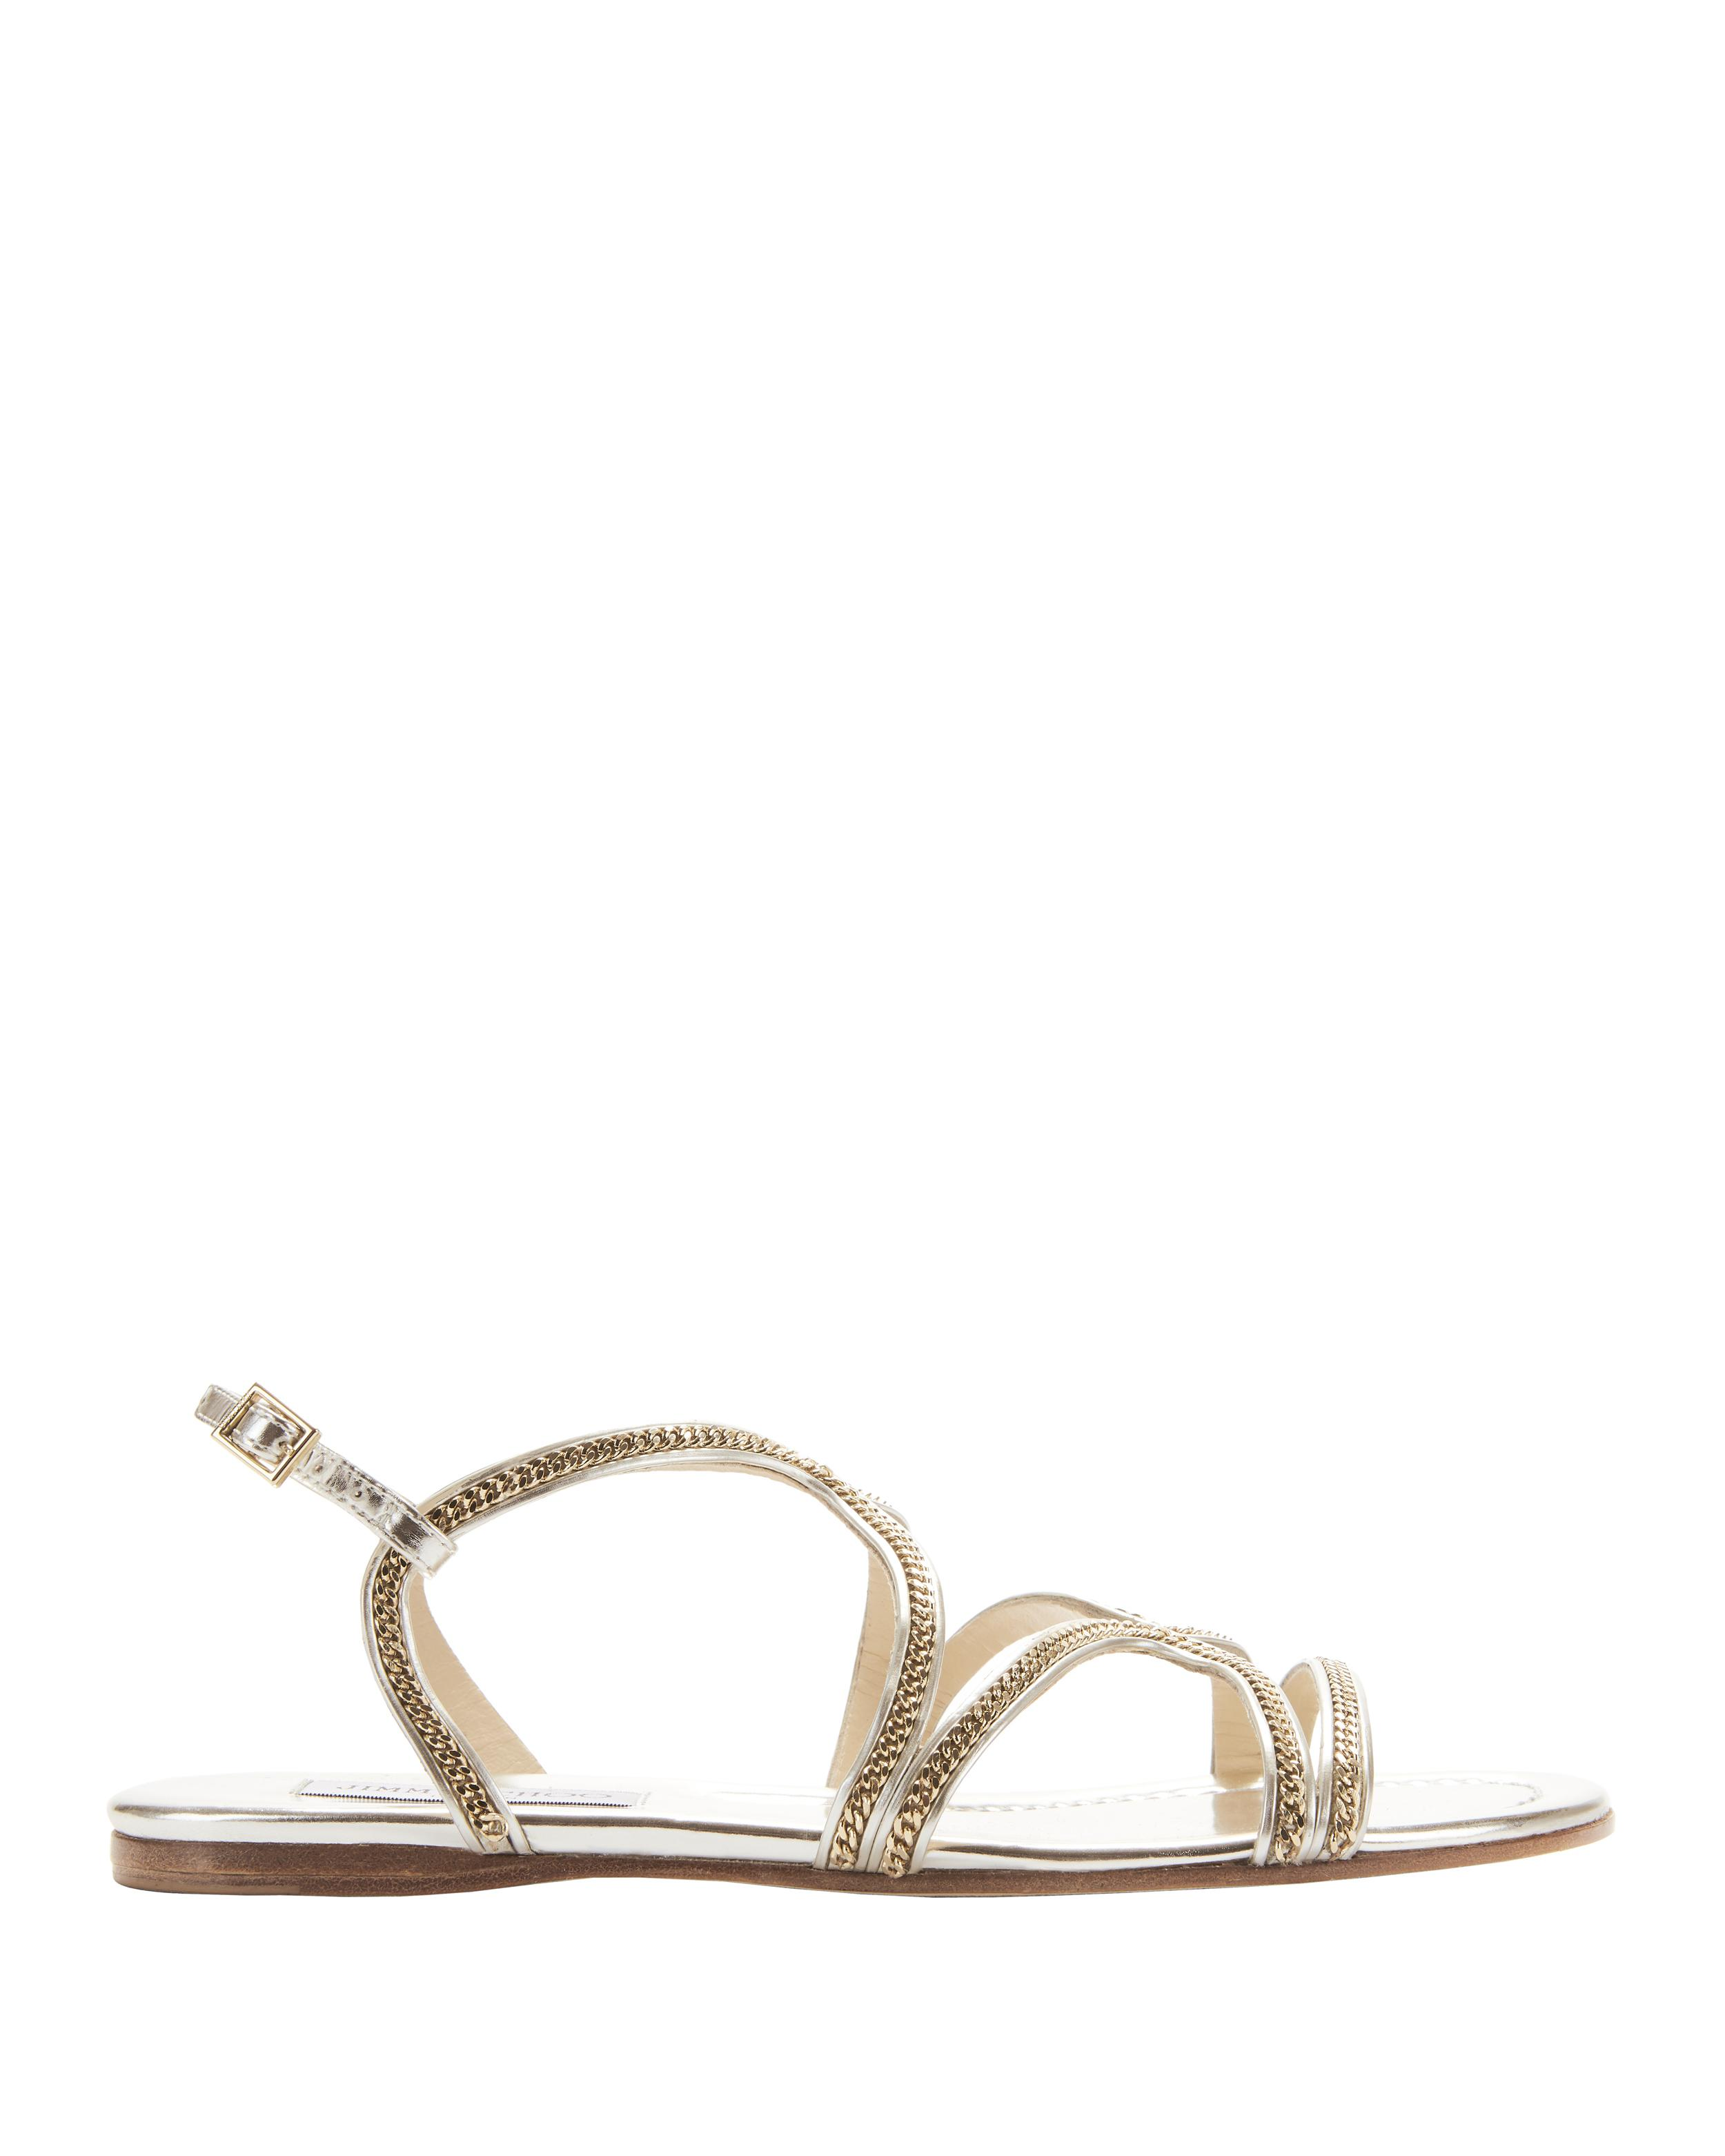 fea184ad36c74d Lyst - Jimmy Choo Nickel Strappy Flat Sandal in Metallic